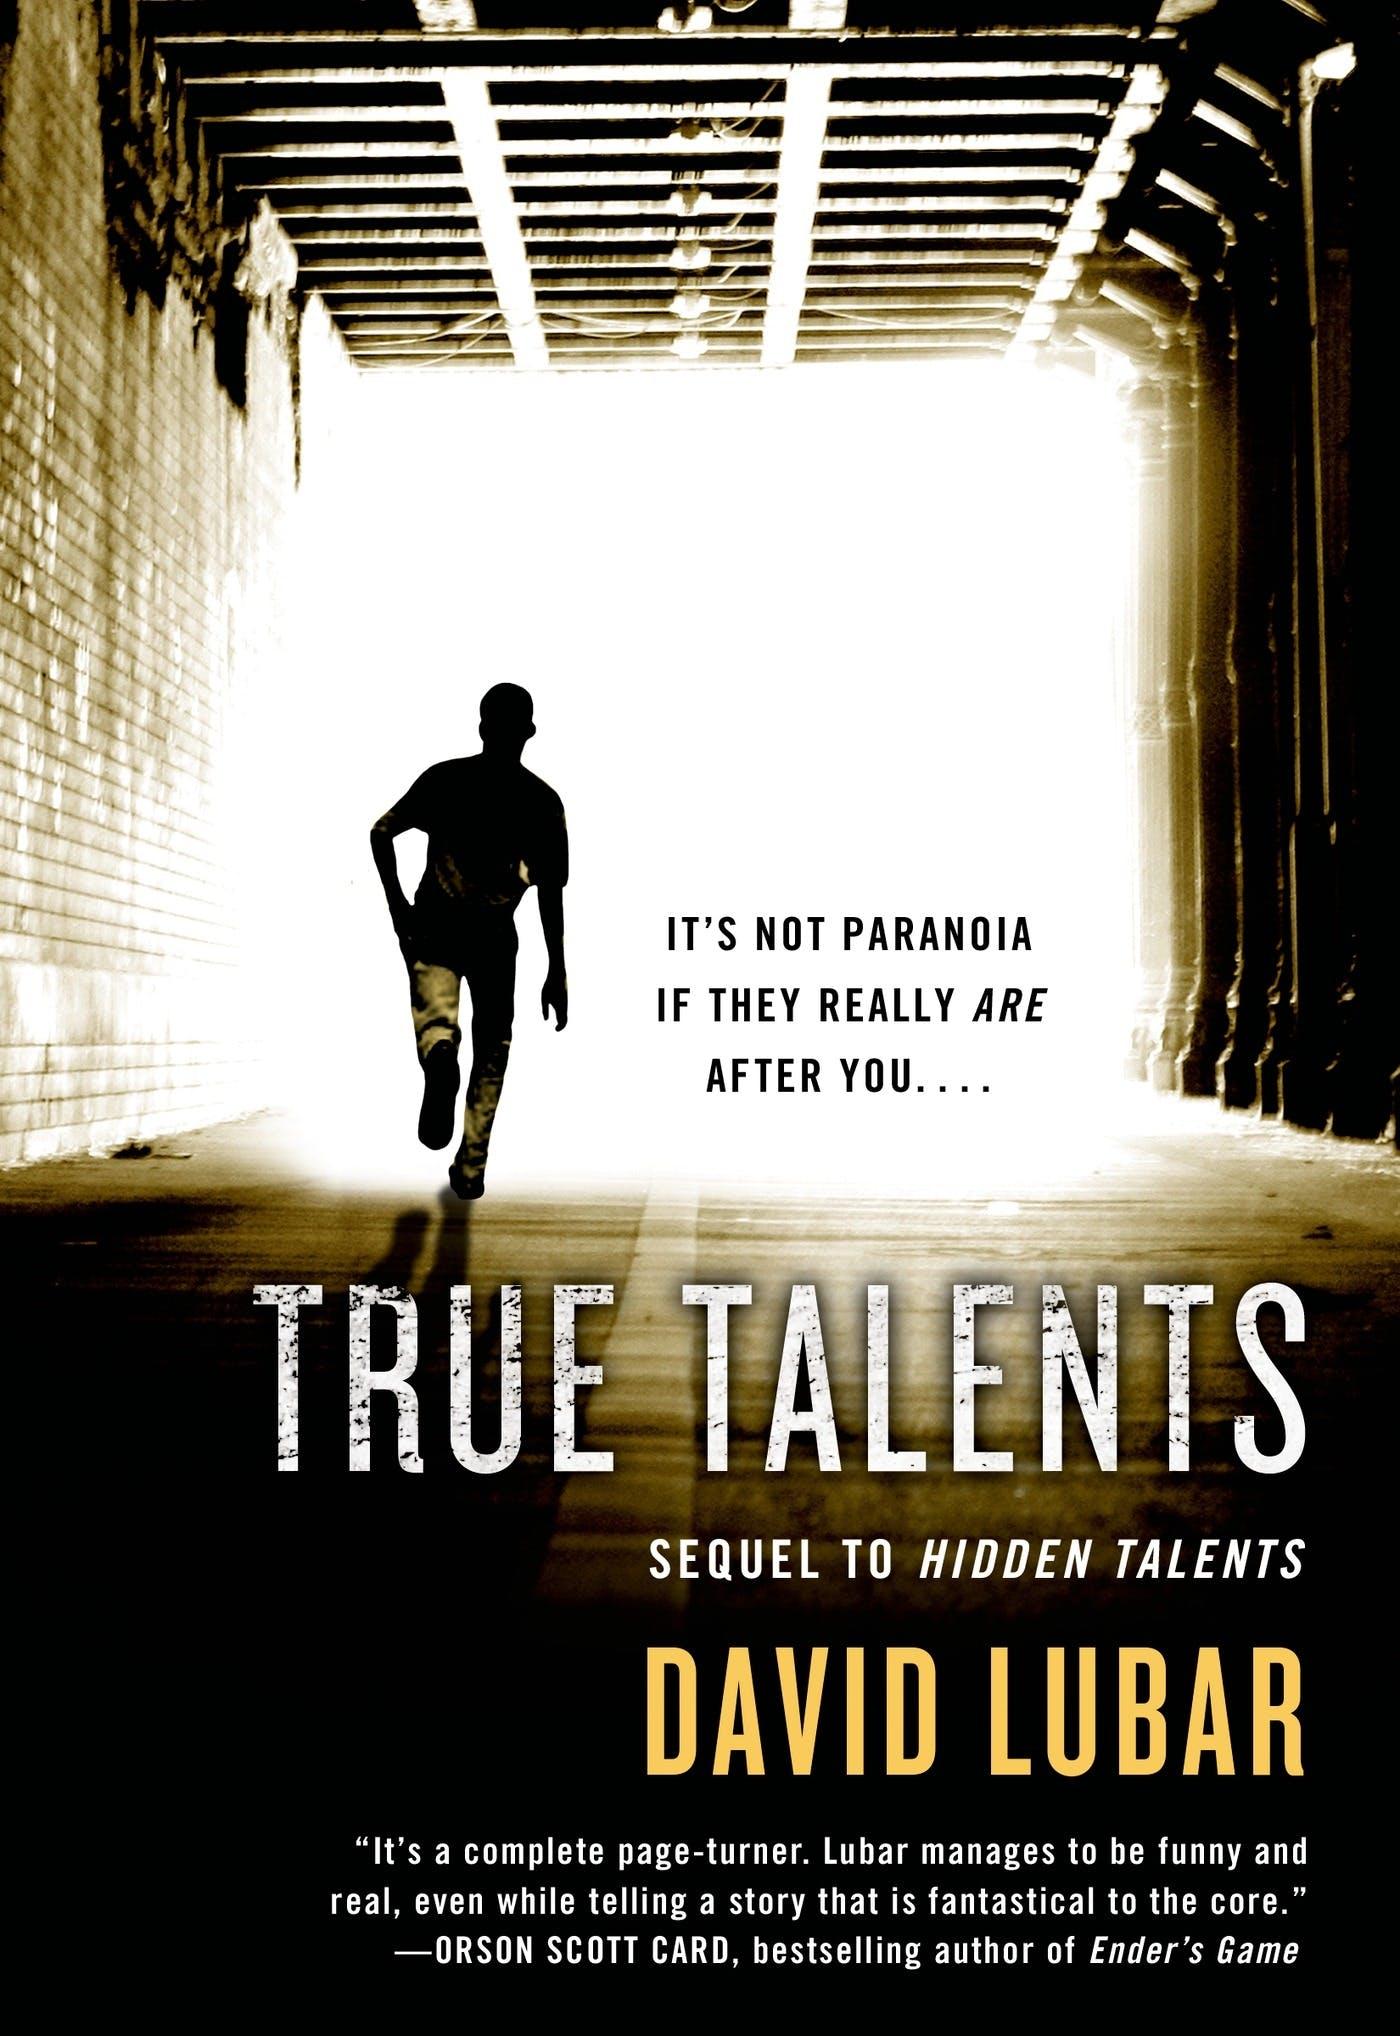 Image of True Talents